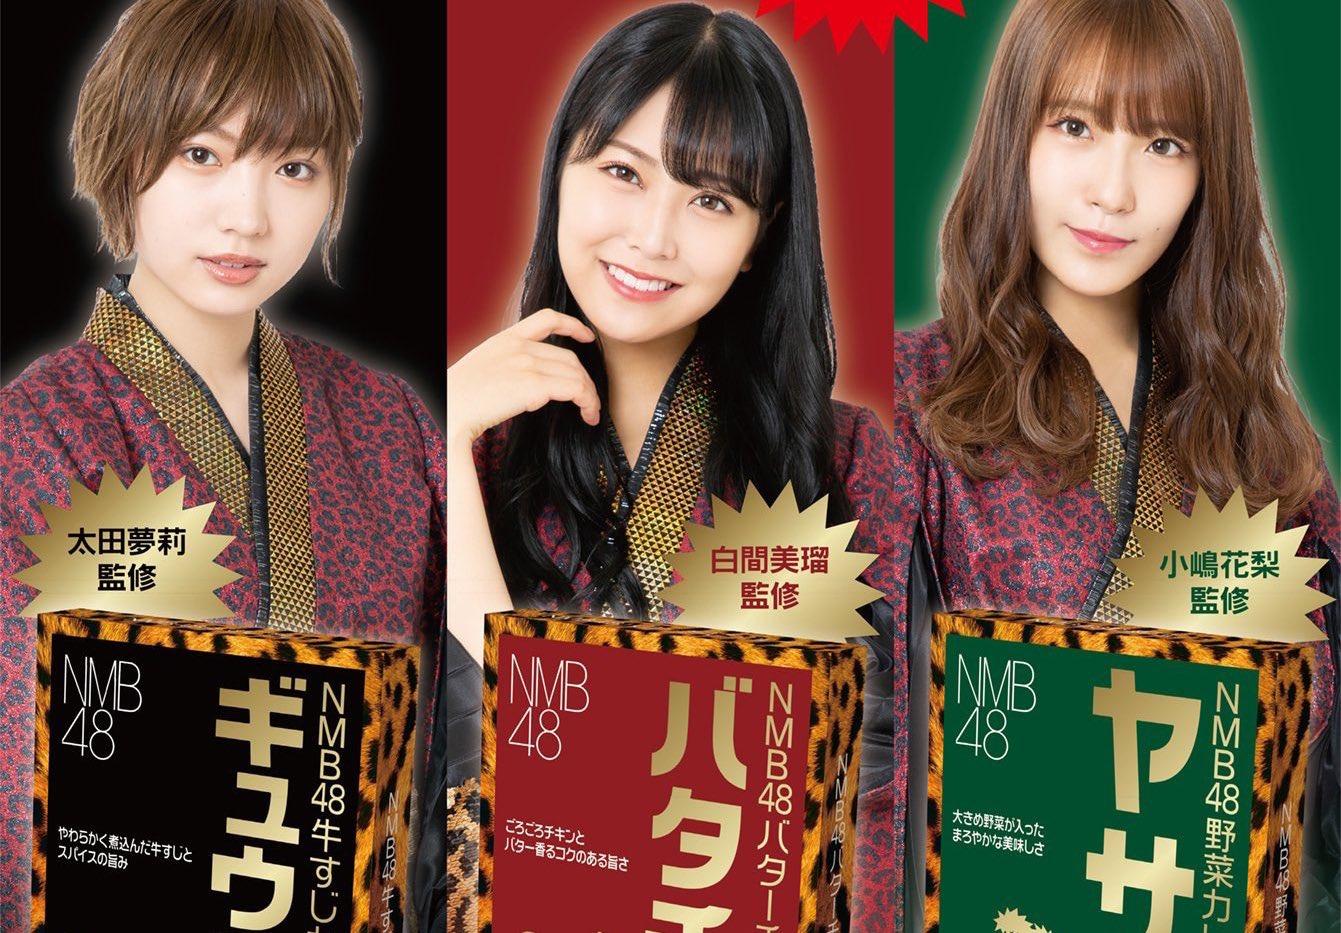 【NMB48】太田夢莉・白間美瑠・小嶋花梨がプロデュースしたレトルトカレー3種類が発売